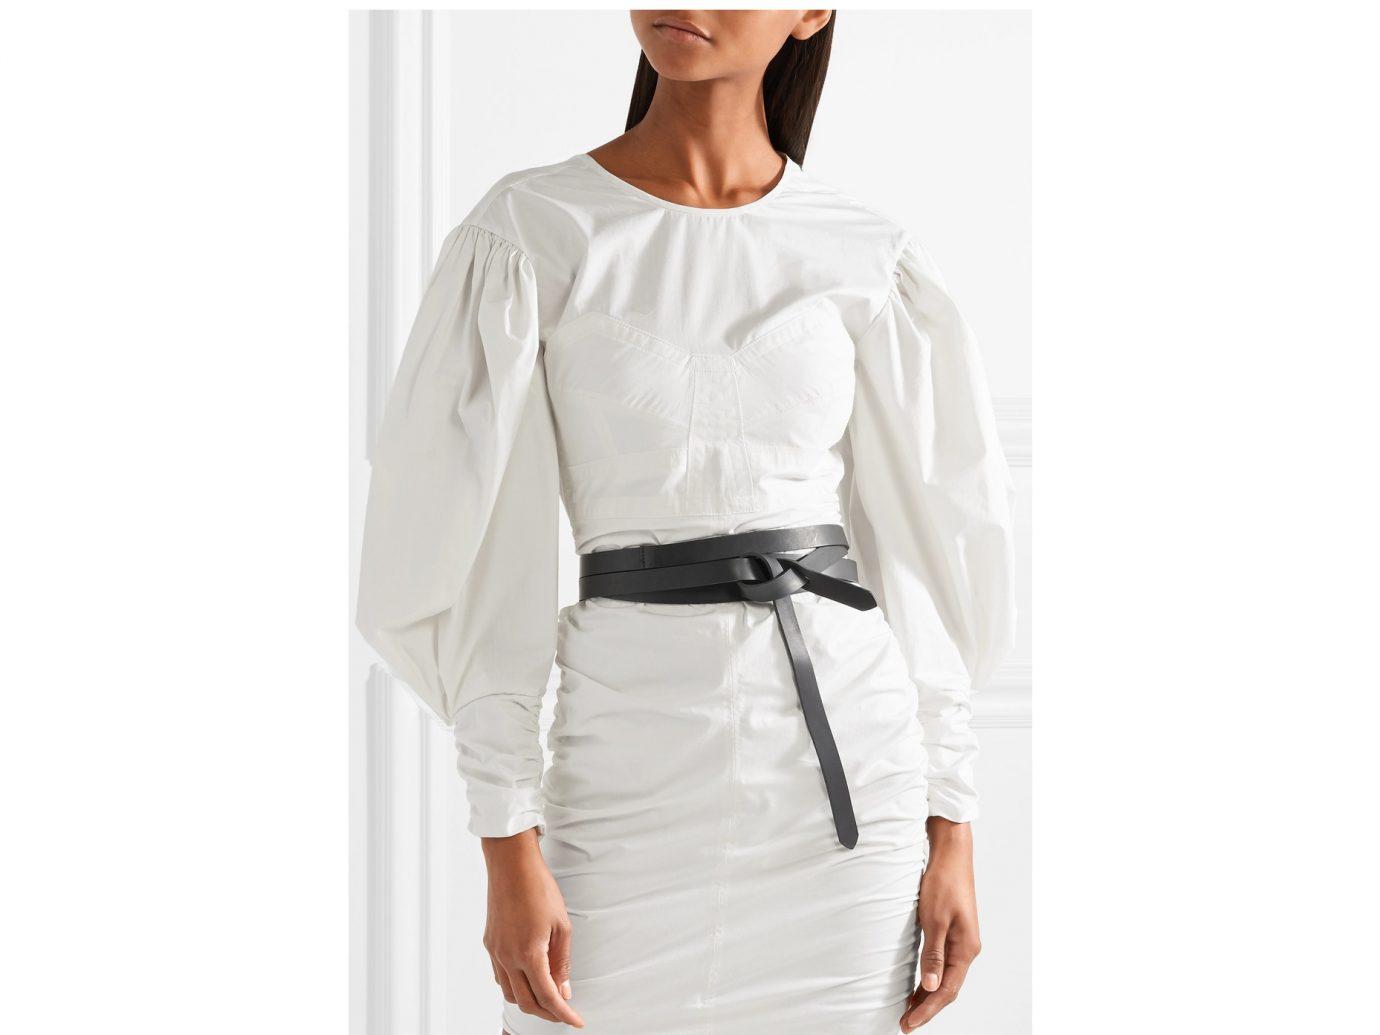 Isabel Marant Lonny Leather Belt